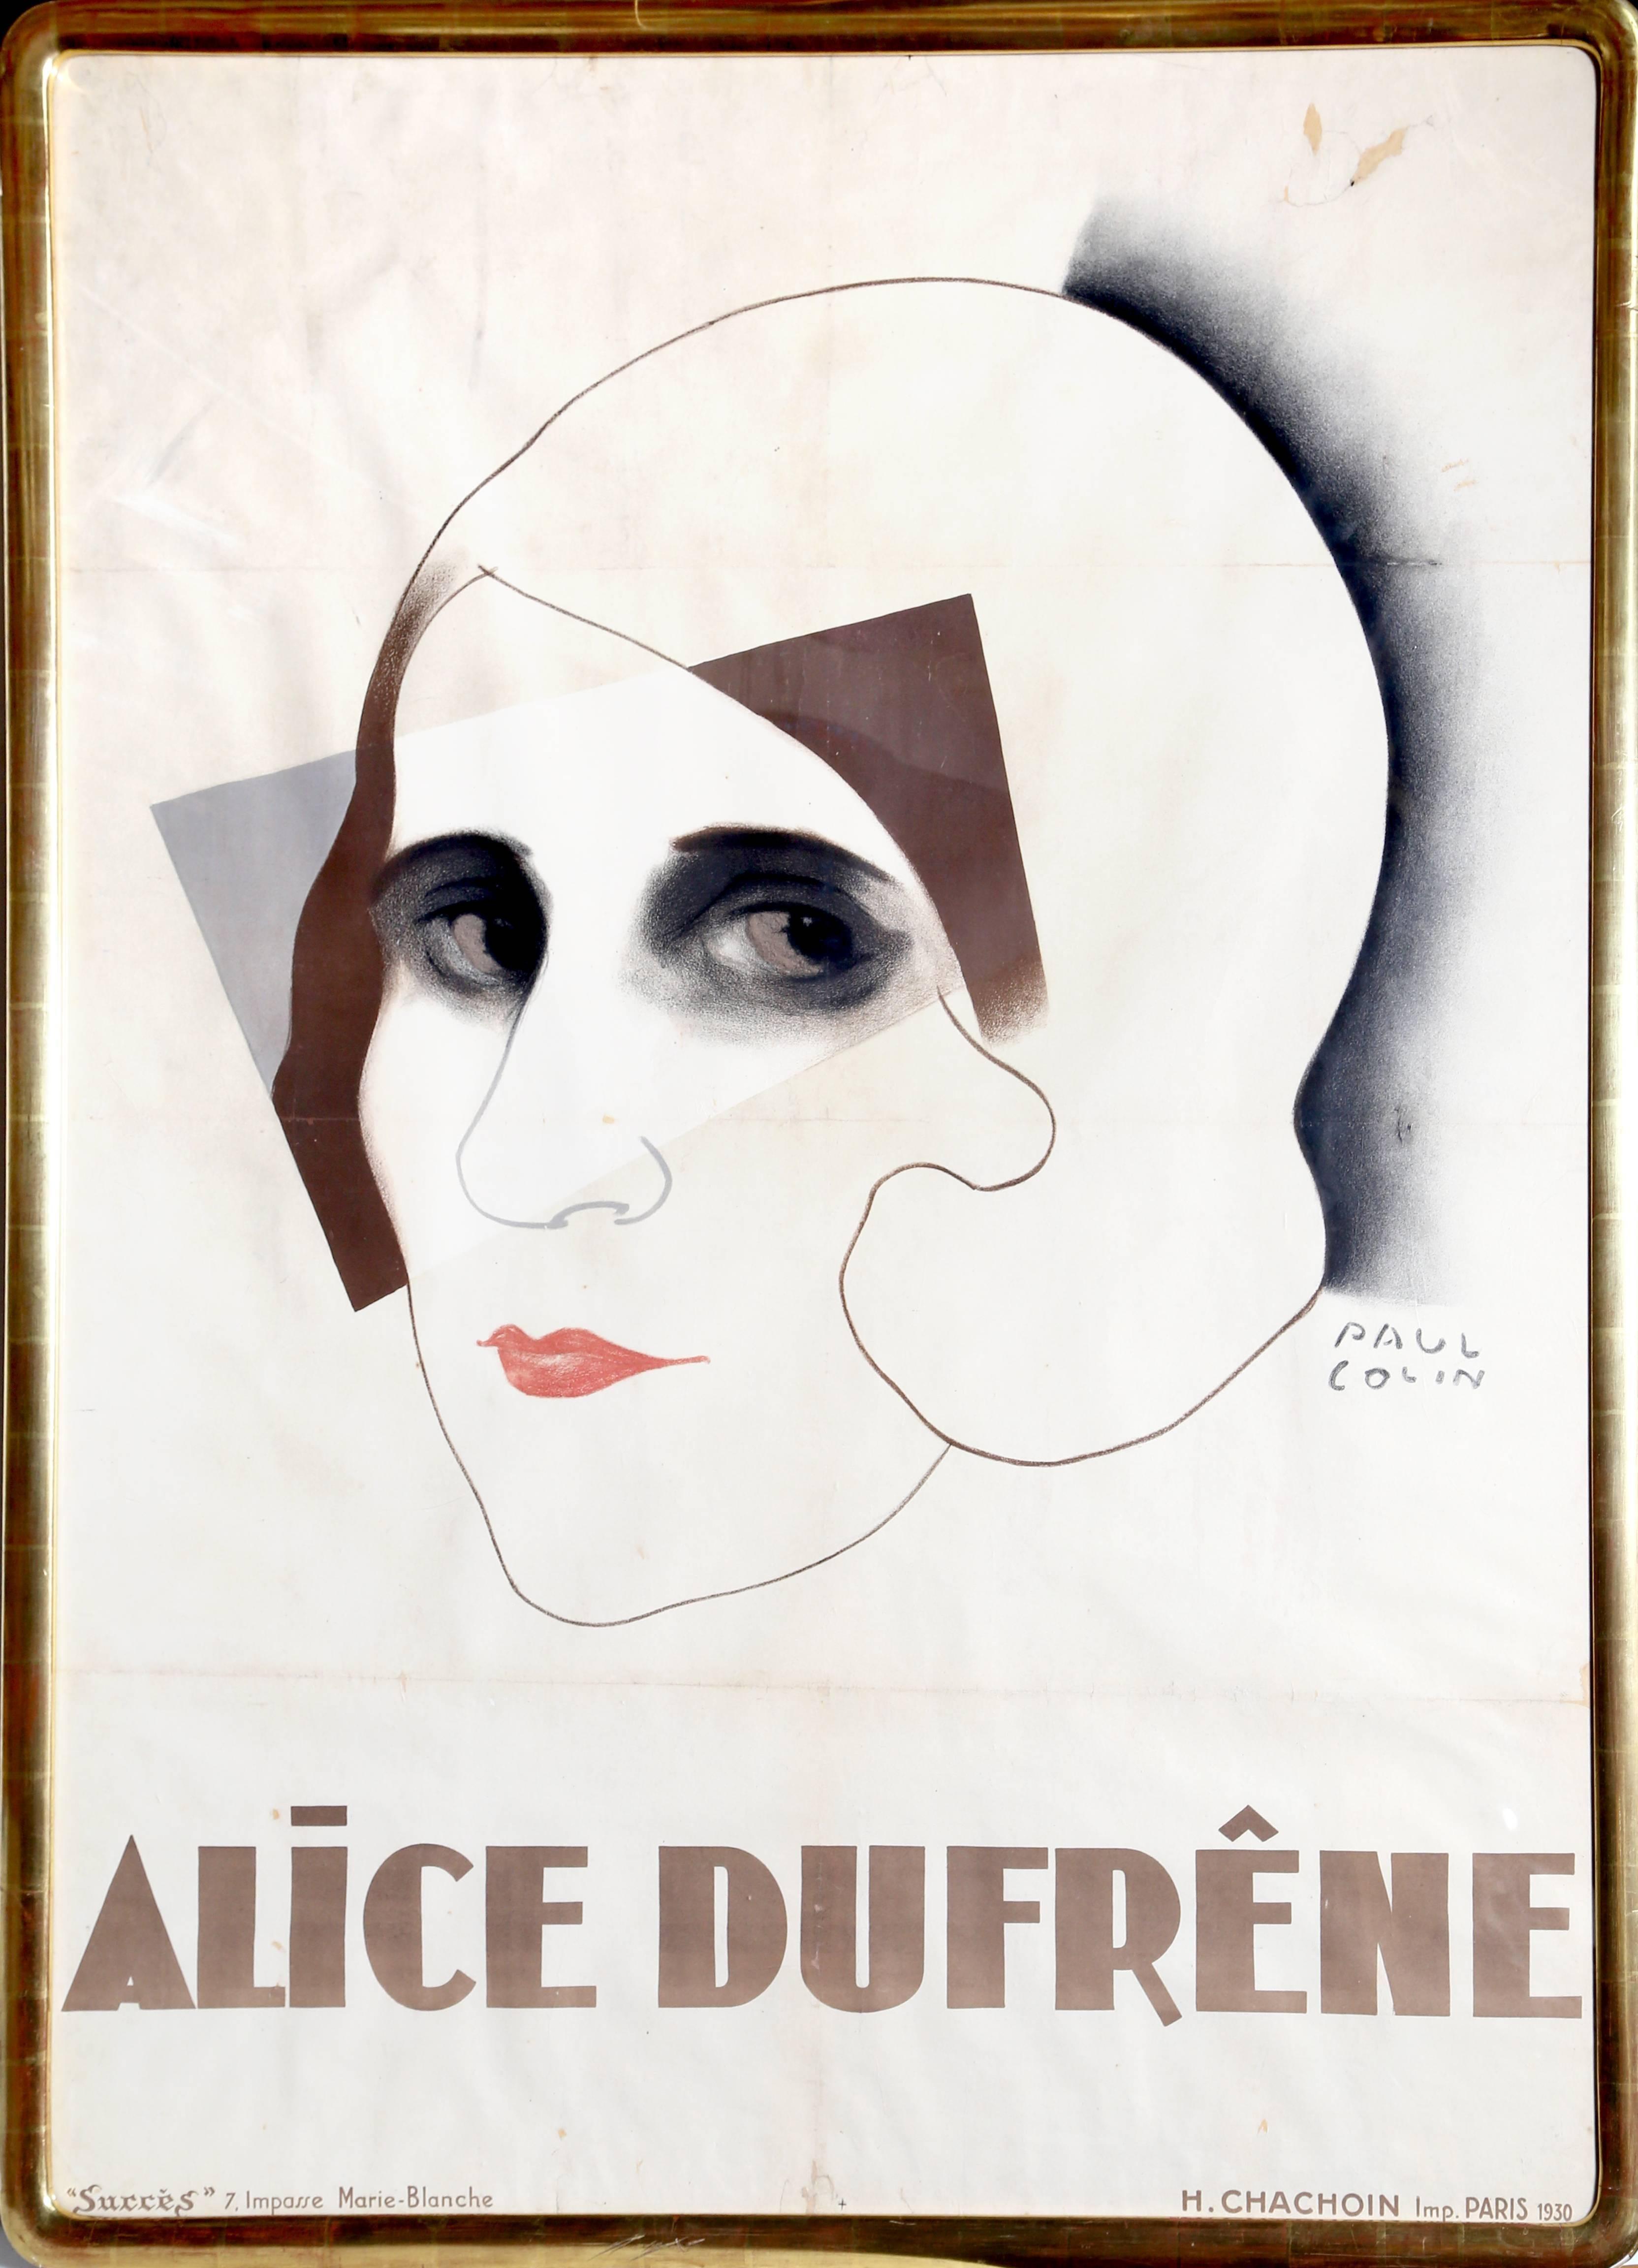 Alice Dufrene